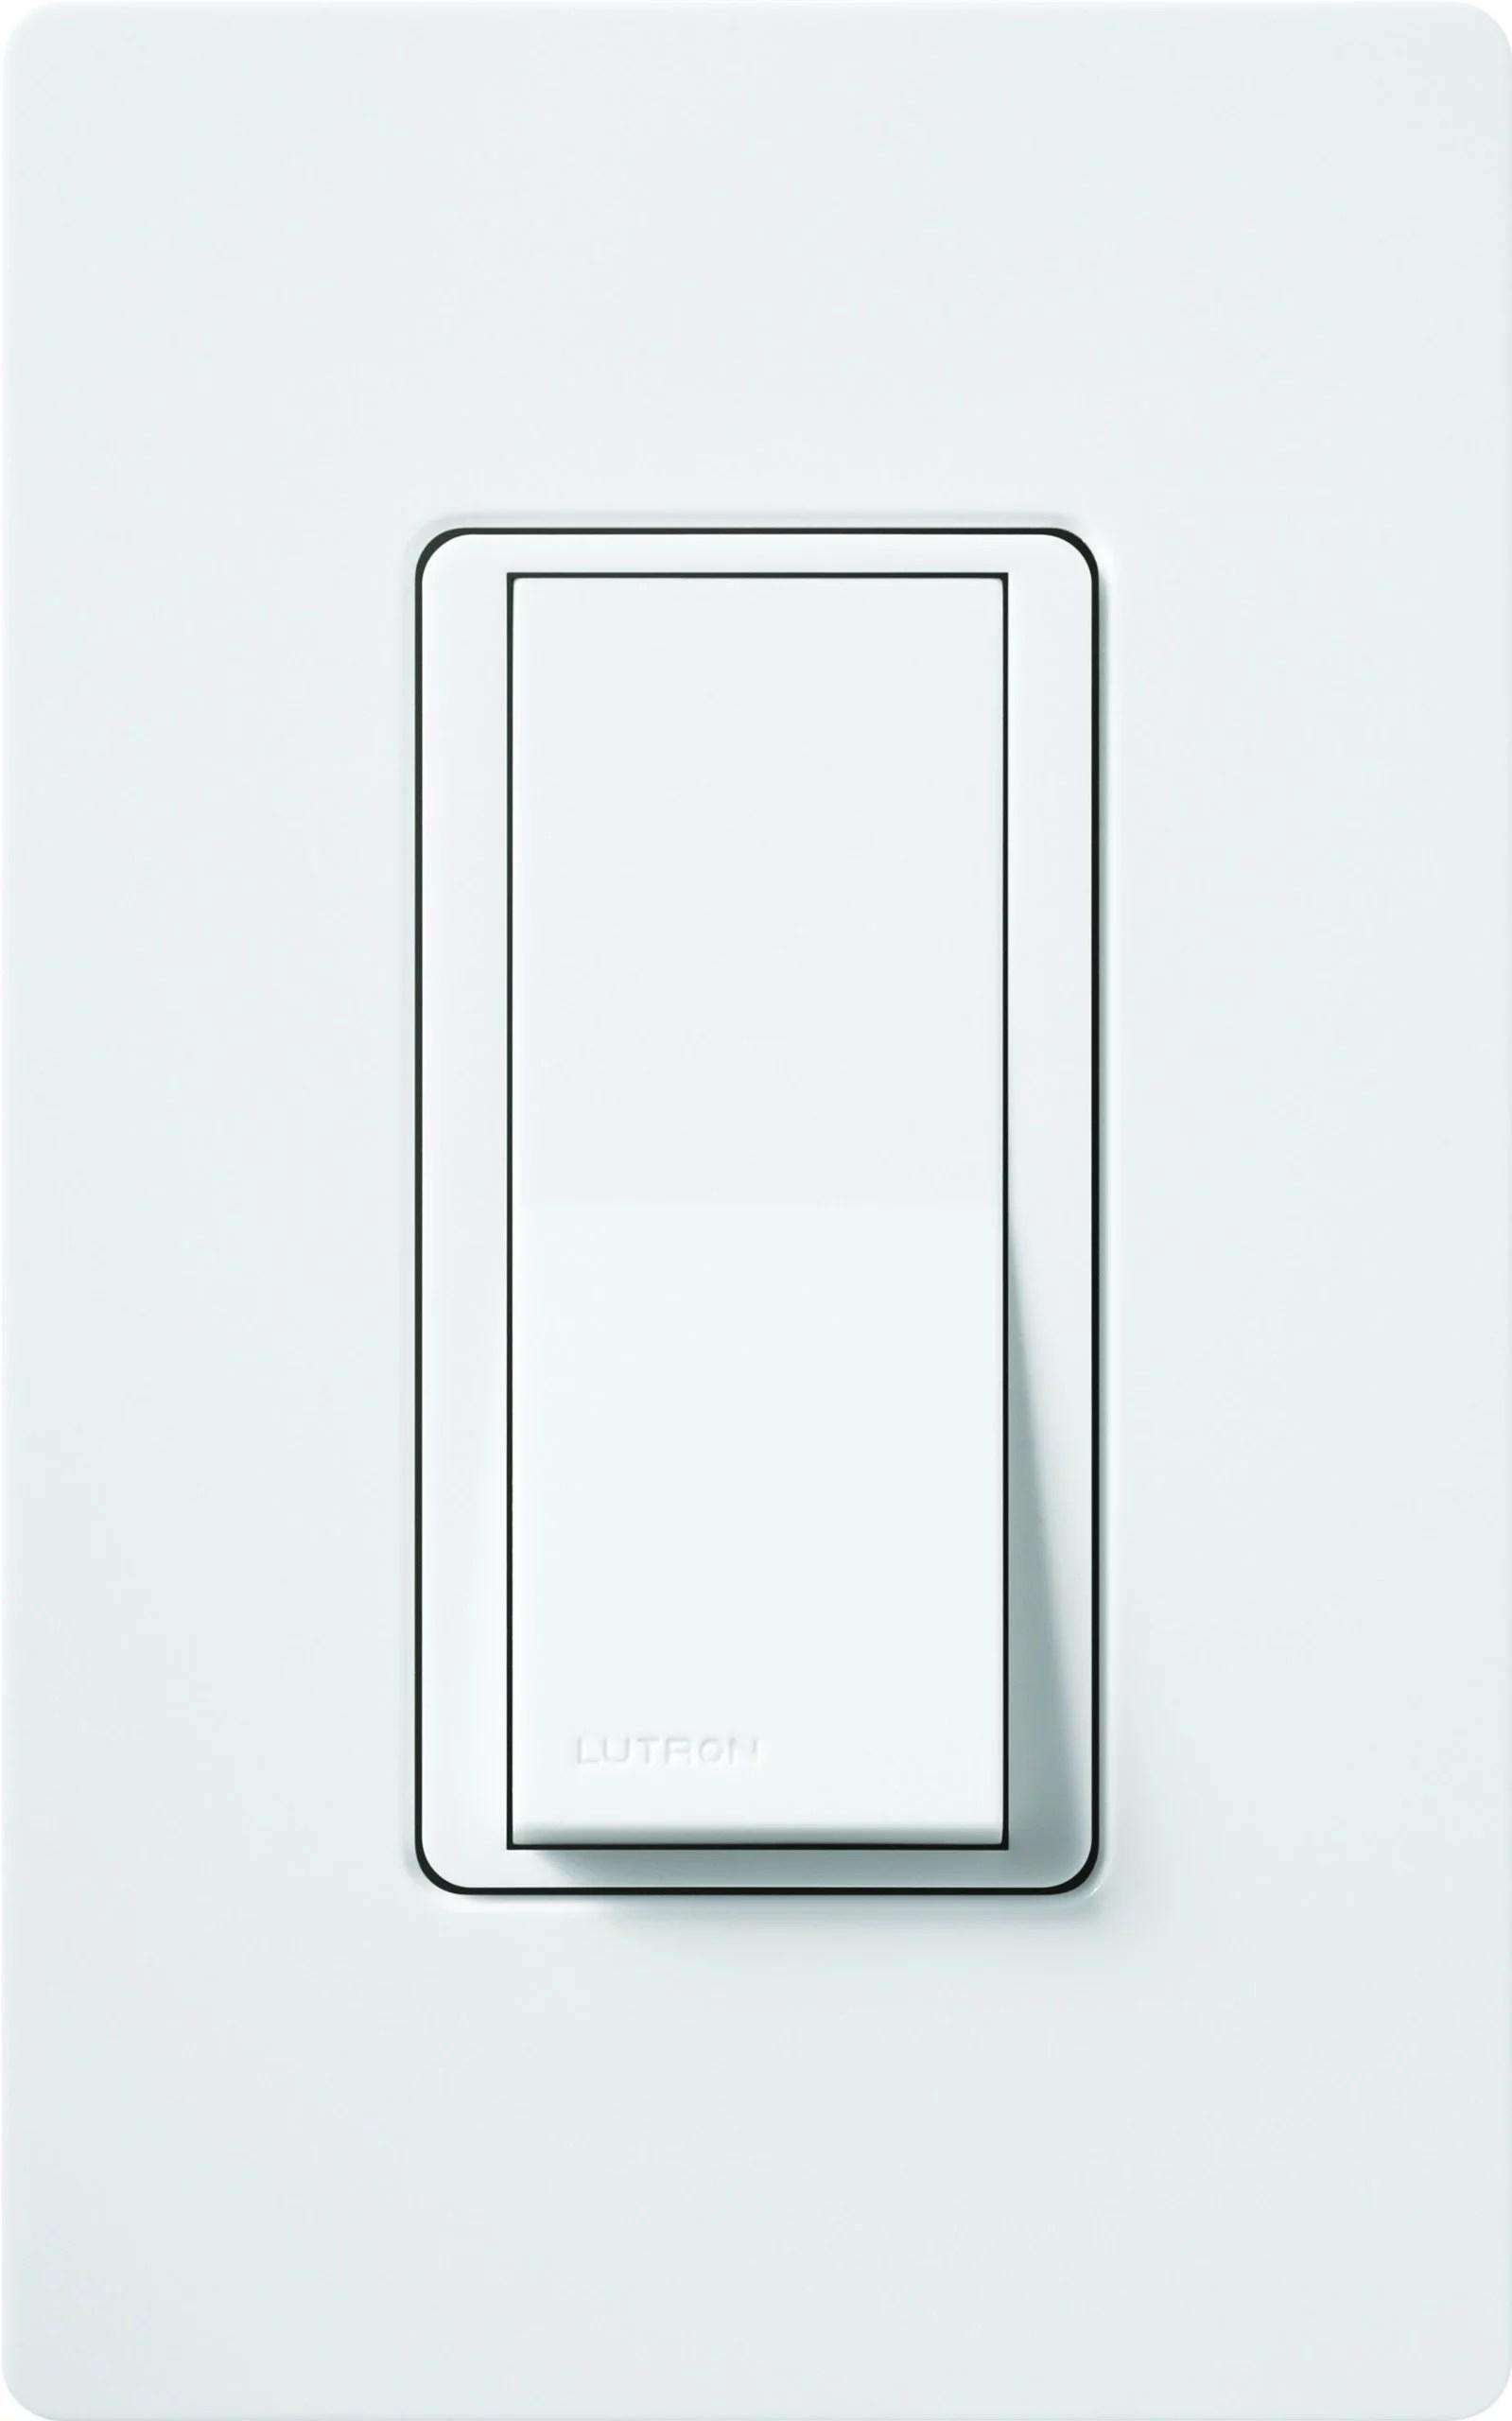 hight resolution of lutron 01627 120 volt 600 watt single pole 3 way switch with locator light walmart com